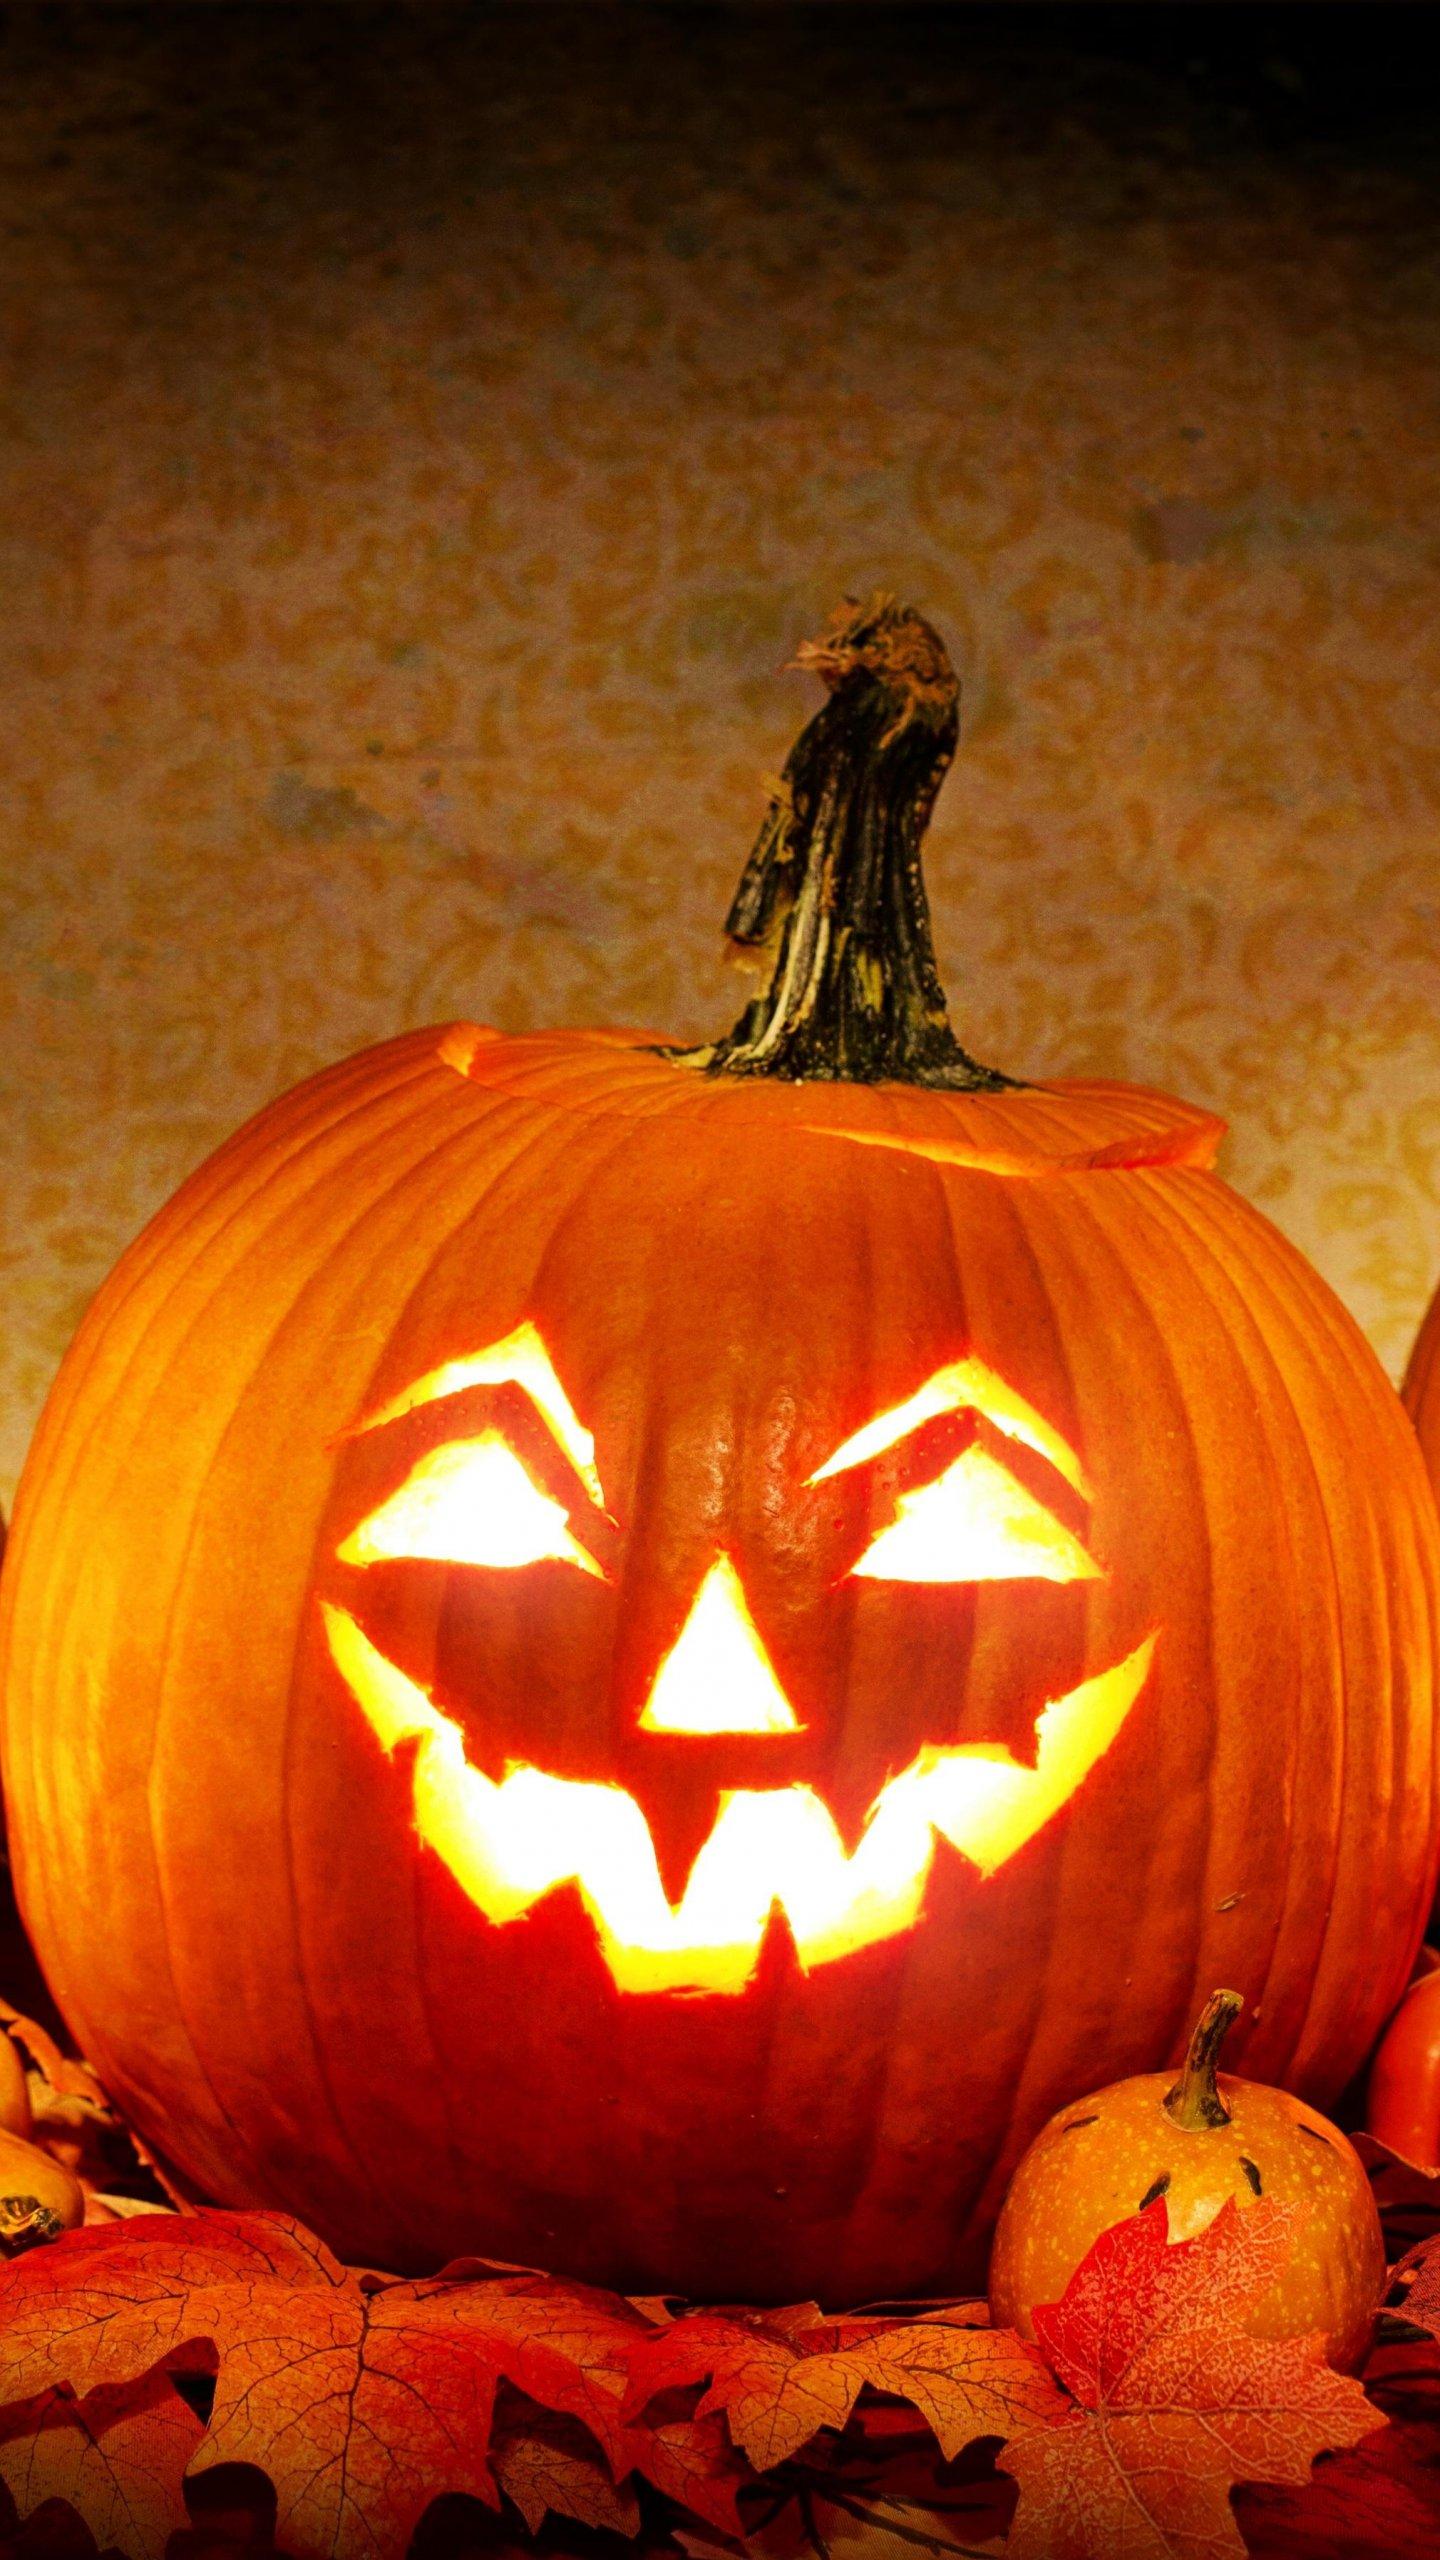 Halloween Pumpkin Wallpaper Iphone.Jack O Lantern Halloween Pumpkin Wallpaper Iphone Android